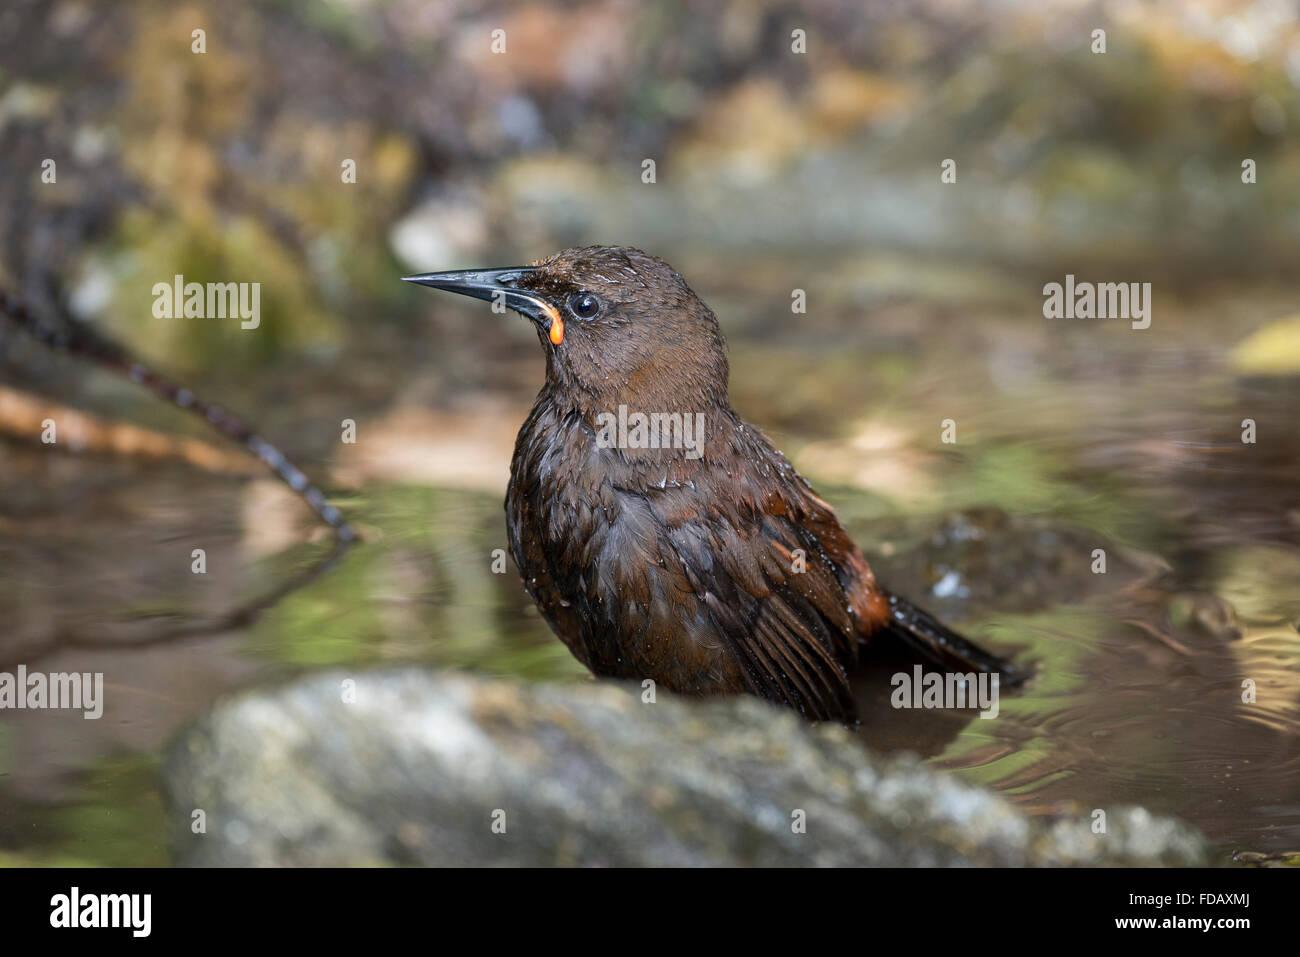 Nuova Zelanda Marlborough Sounds, Isola di Motuara aka Motu Ara. Predator-free Island Bird Reserve. Femmina Isola del Sud a doppio spiovente. Foto Stock